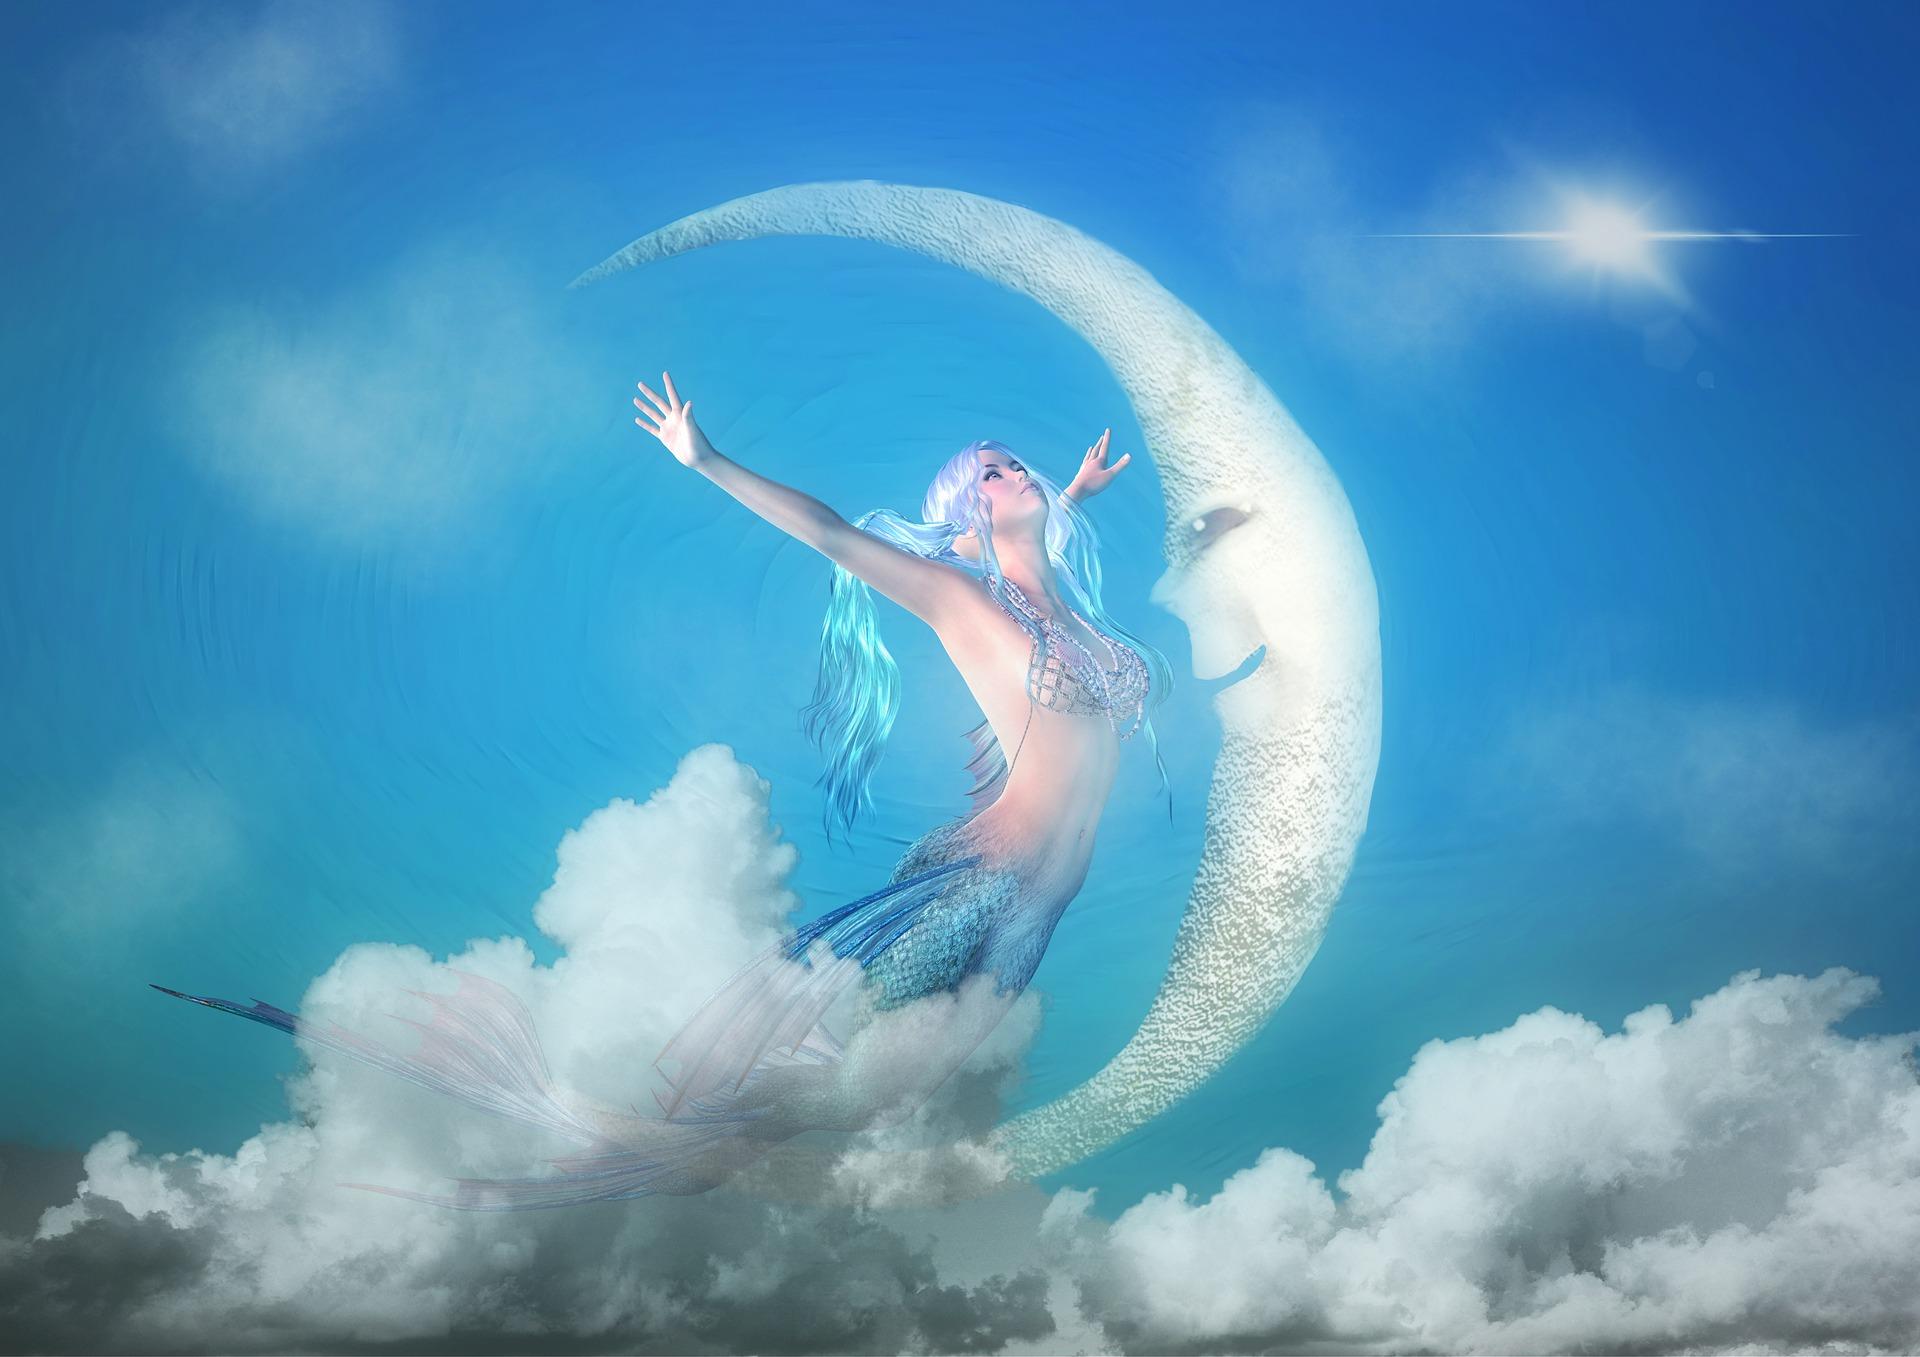 horoscop saptamanal - sfatulparintilor.ro - pixabay_com - blue-2061782_1920